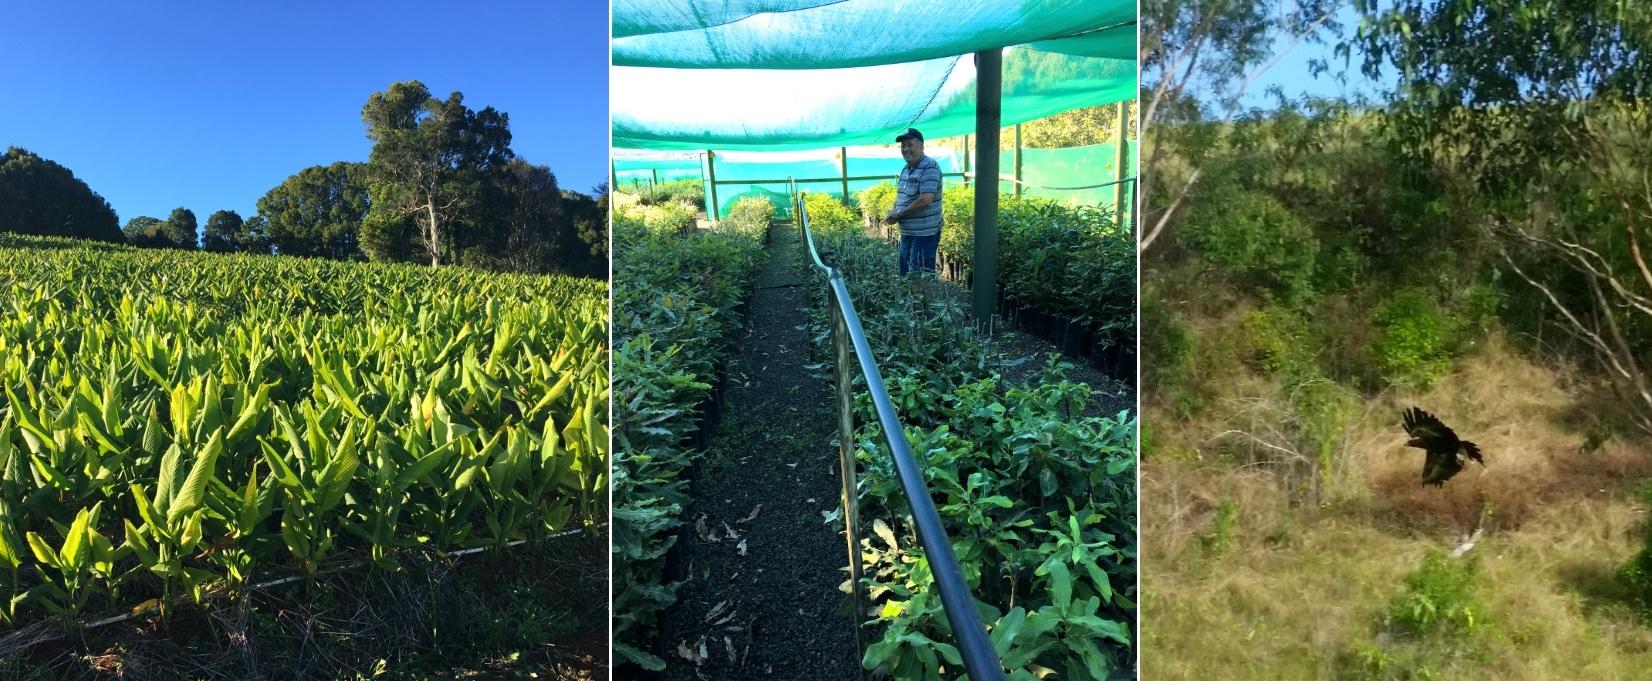 Noan Olivenöl Blog Macadamia Farm Australien